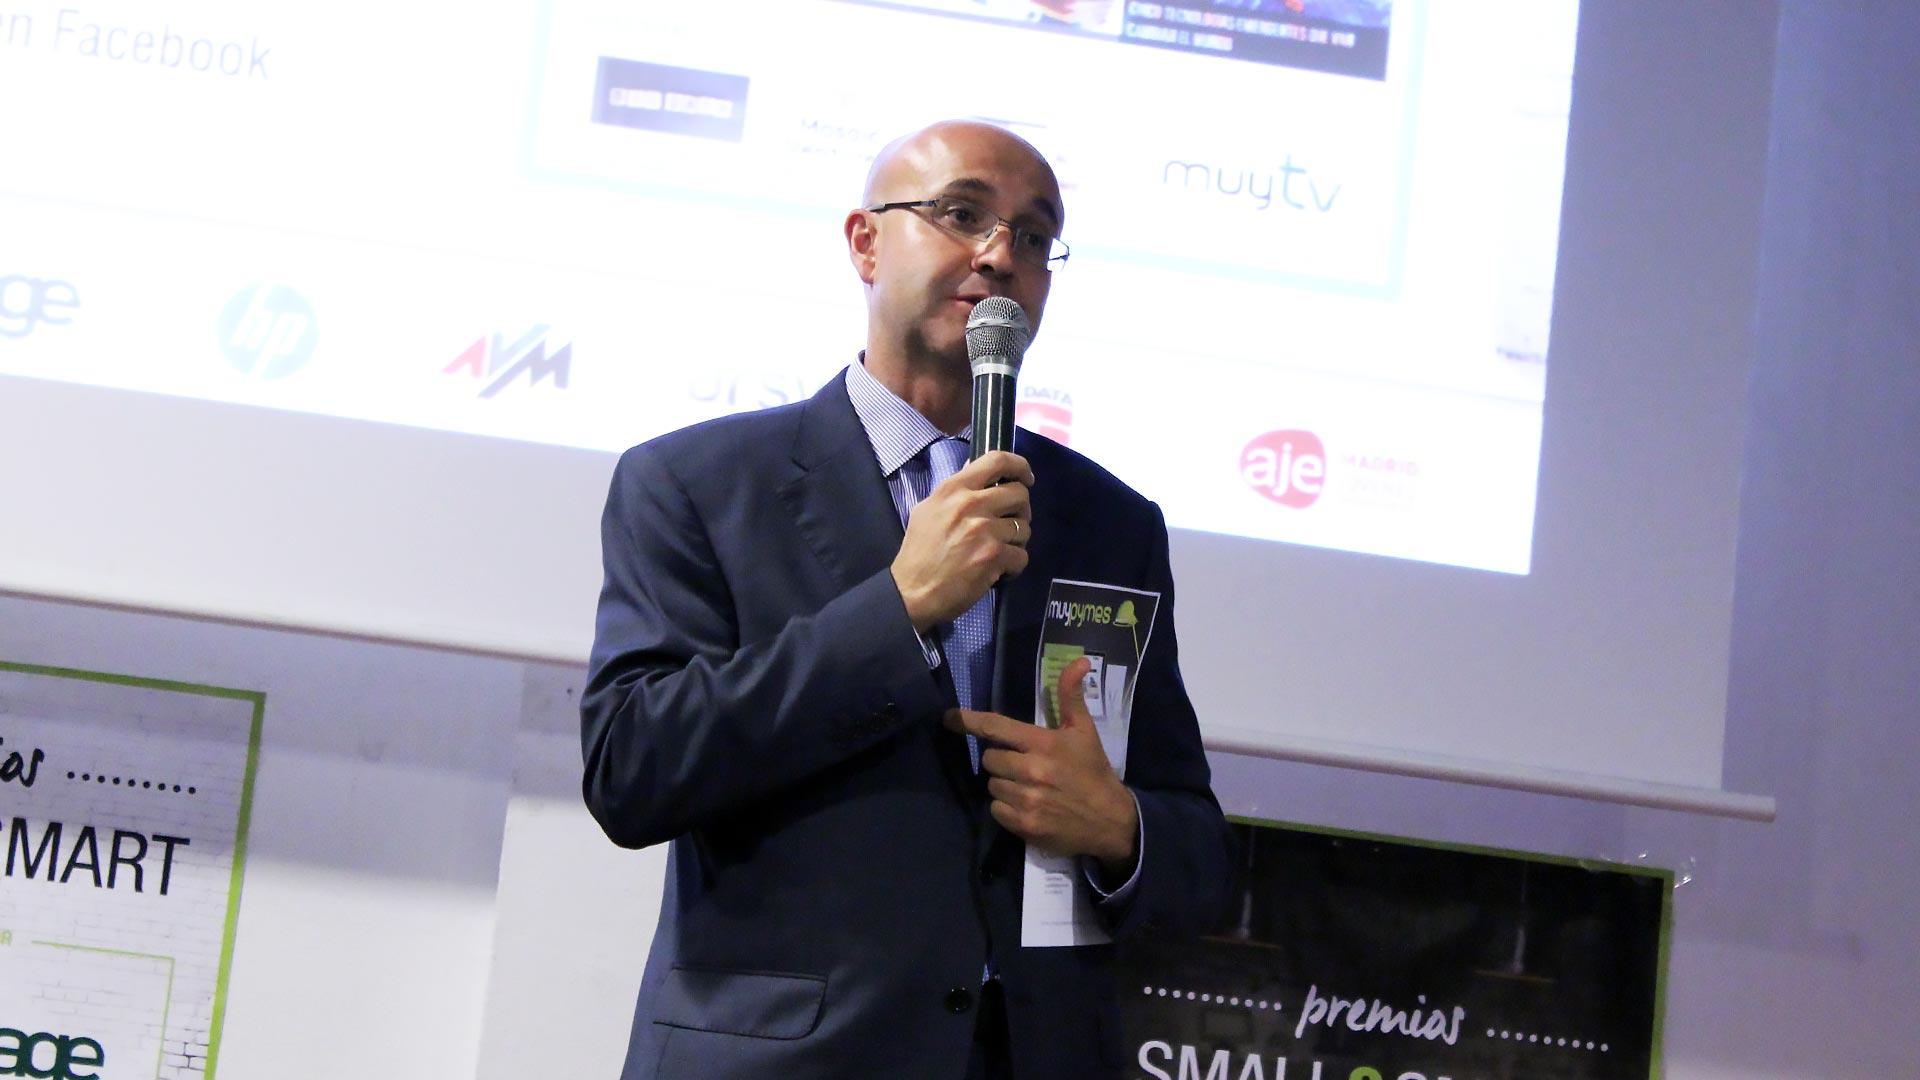 smallsmart-premios-startups-pymes-2015-javierperezcortijo-1